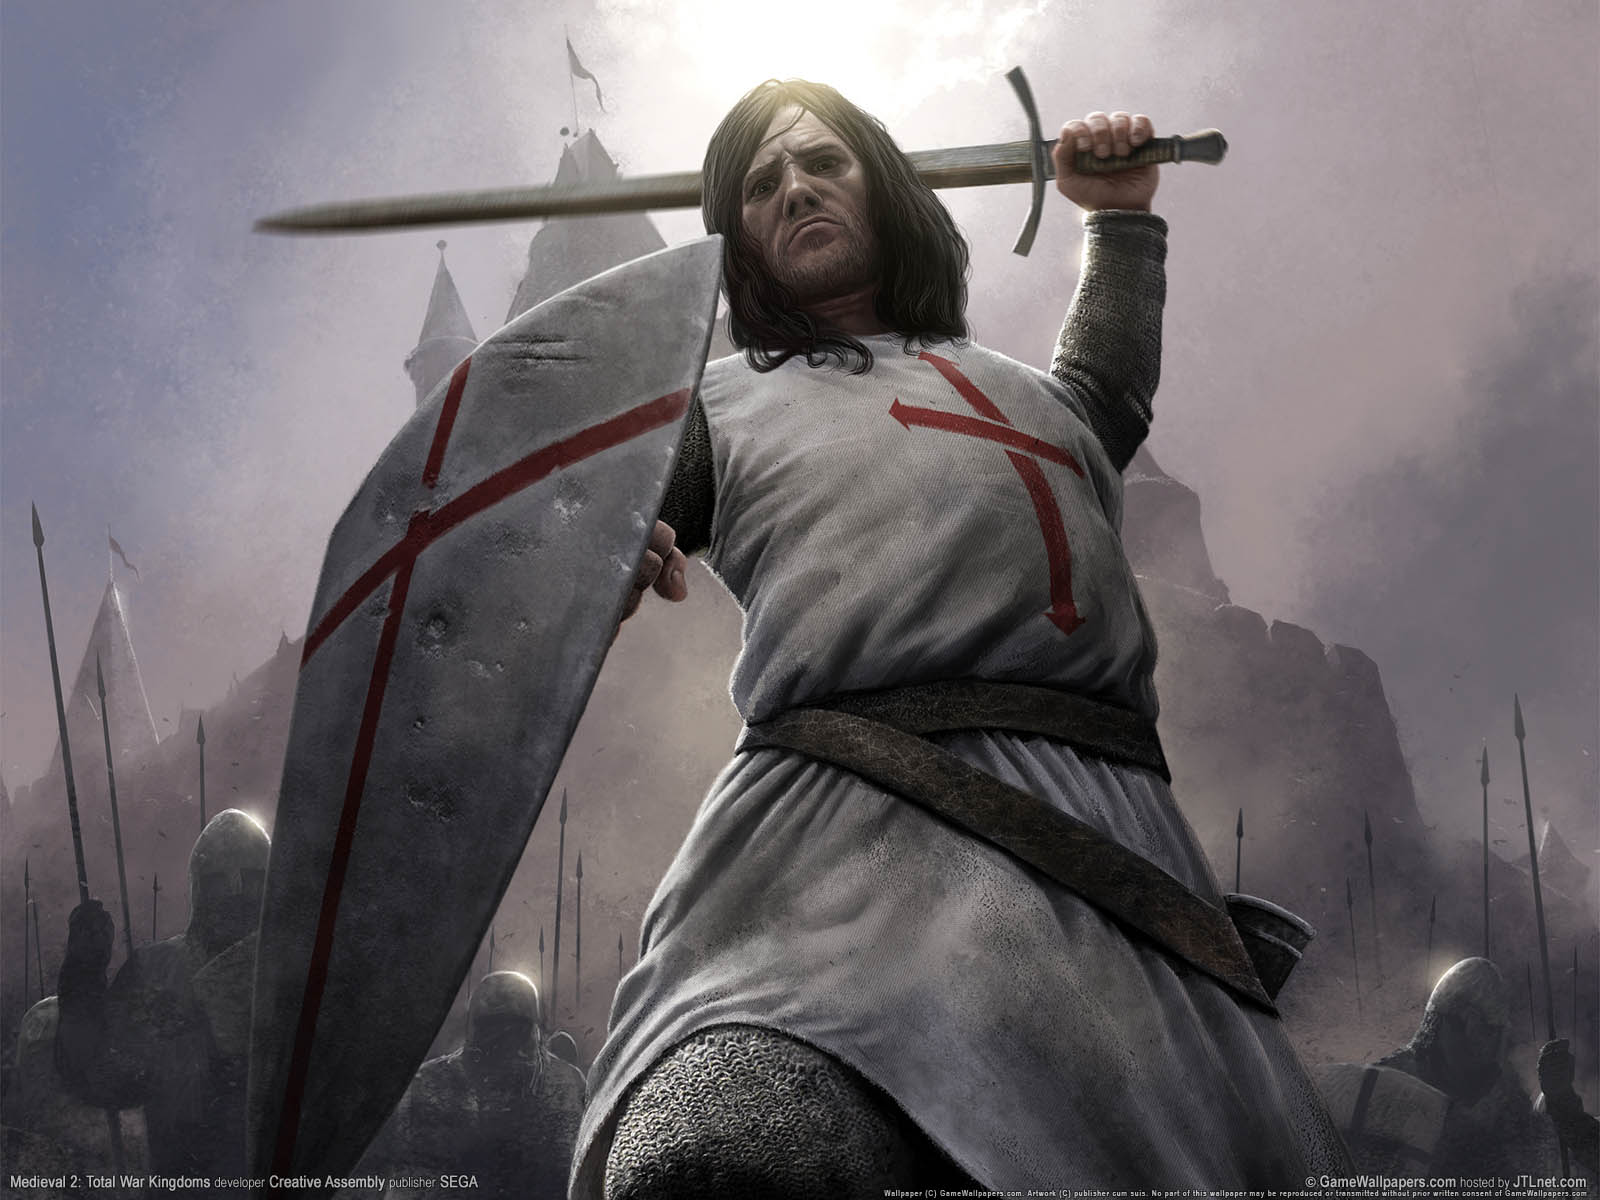 Battle | Kingdoms of Camelot Wiki | FANDOM powered by Wikia on merlin map, runes of magic map, mabinogi map, elsword map,